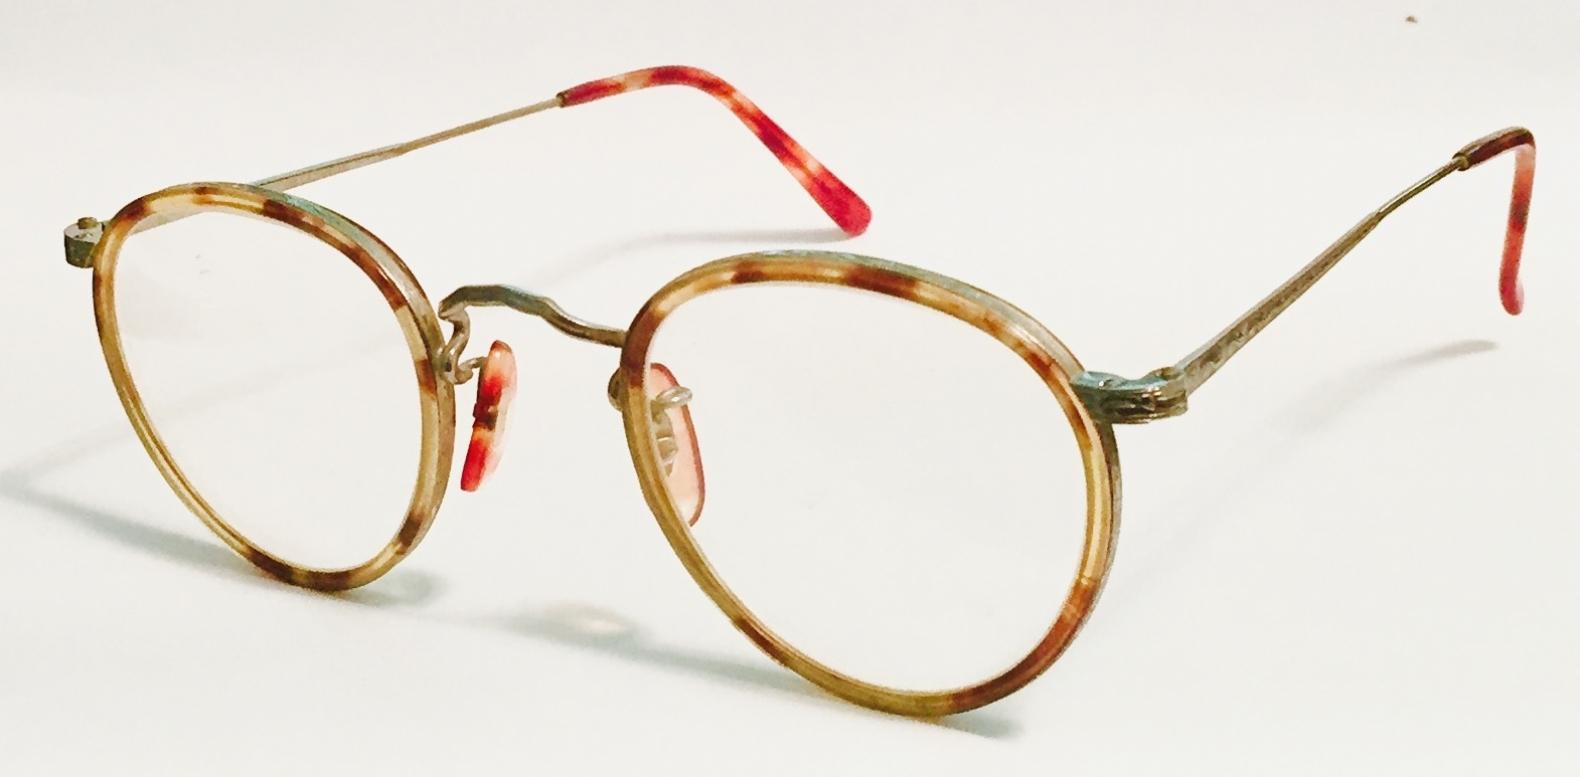 99729de0f80 Buy Oliver Peoples Eyeglasses directly from OpticsFast.com